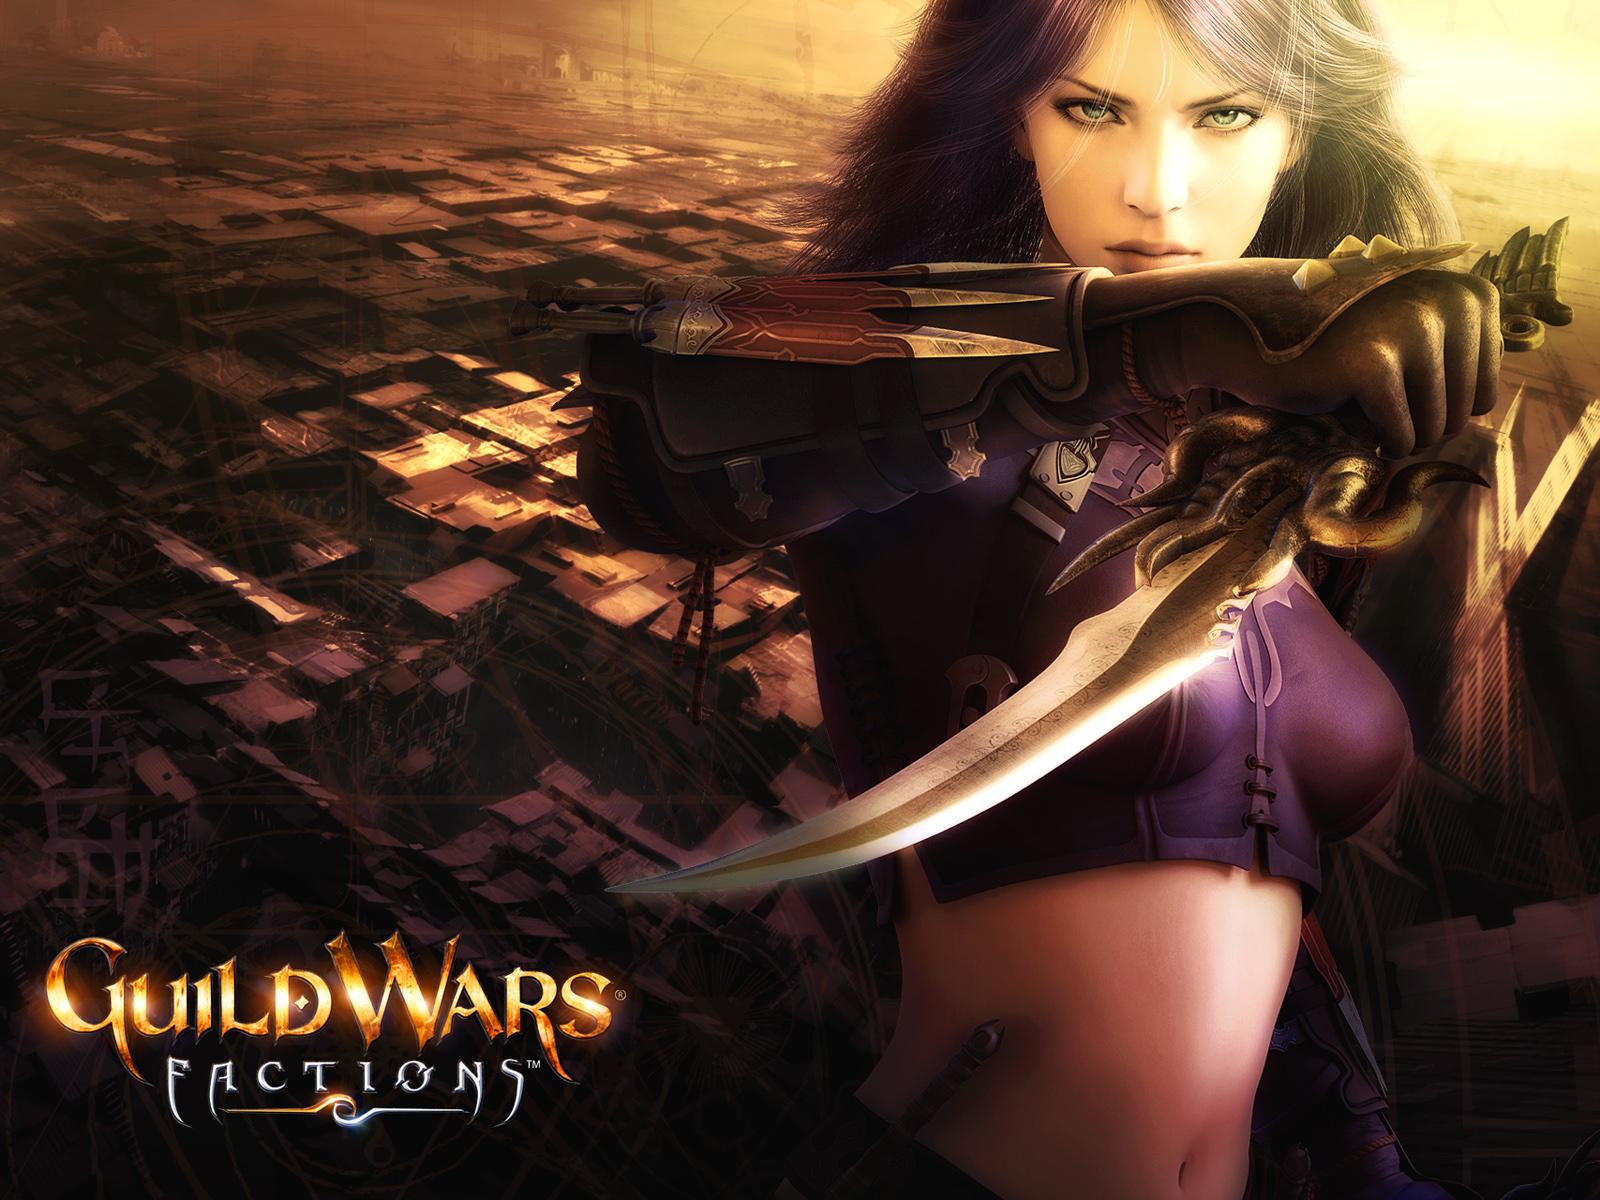 http://3.bp.blogspot.com/-pxLYLfhT3DY/TeDW1wQ8MSI/AAAAAAAACTU/LiiMSFKlbNE/s1600/Guild_wars_faction_1.jpg